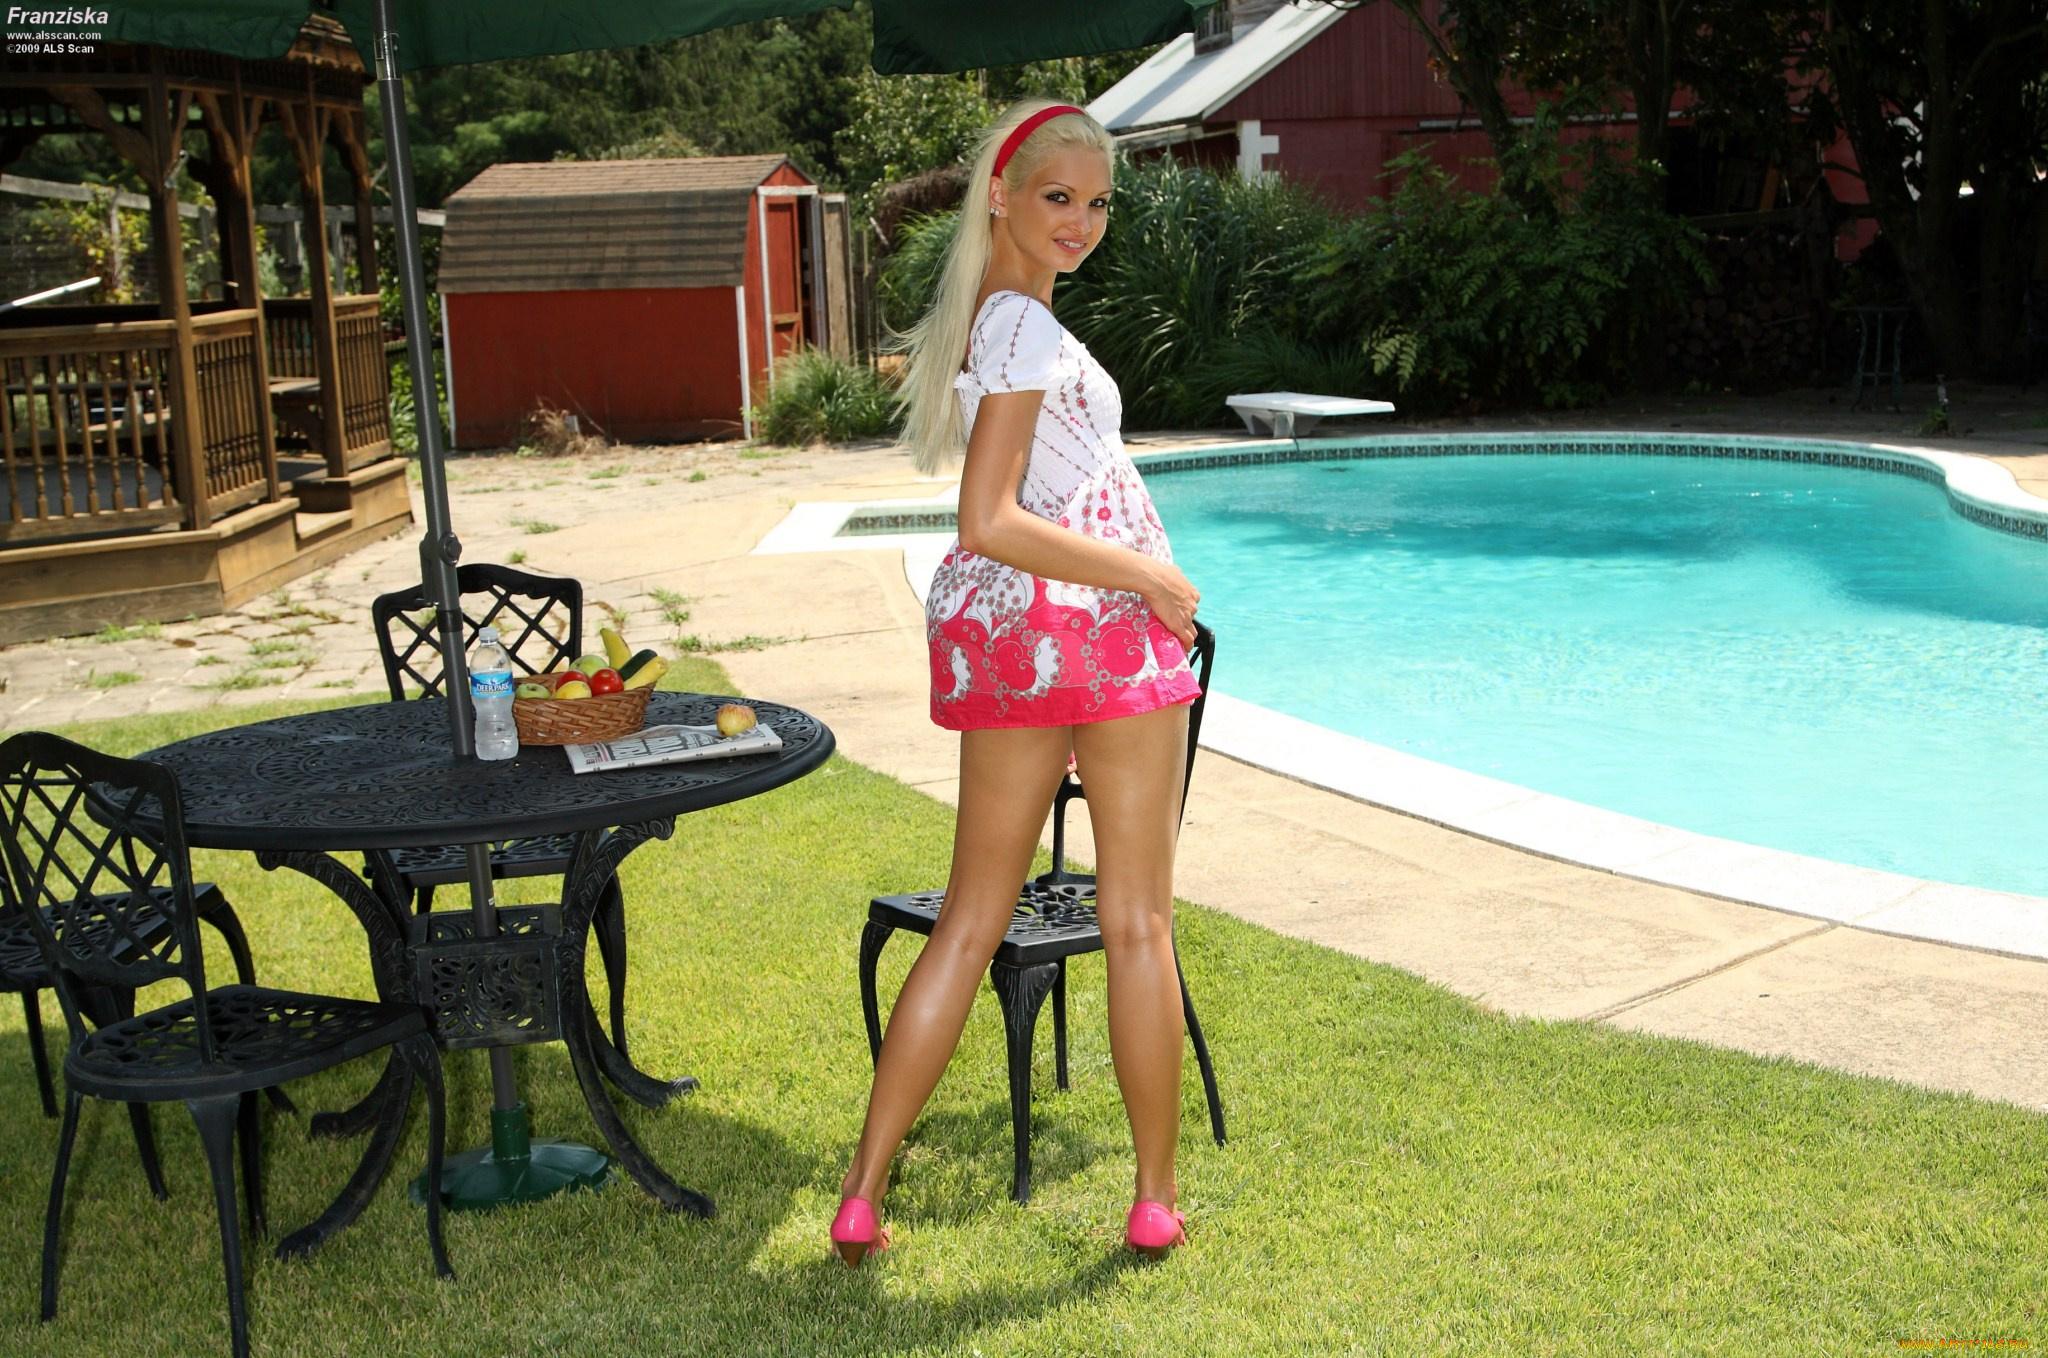 Lovely babe Franziska Facella masturbating her cunt with big toys № 432456 без смс